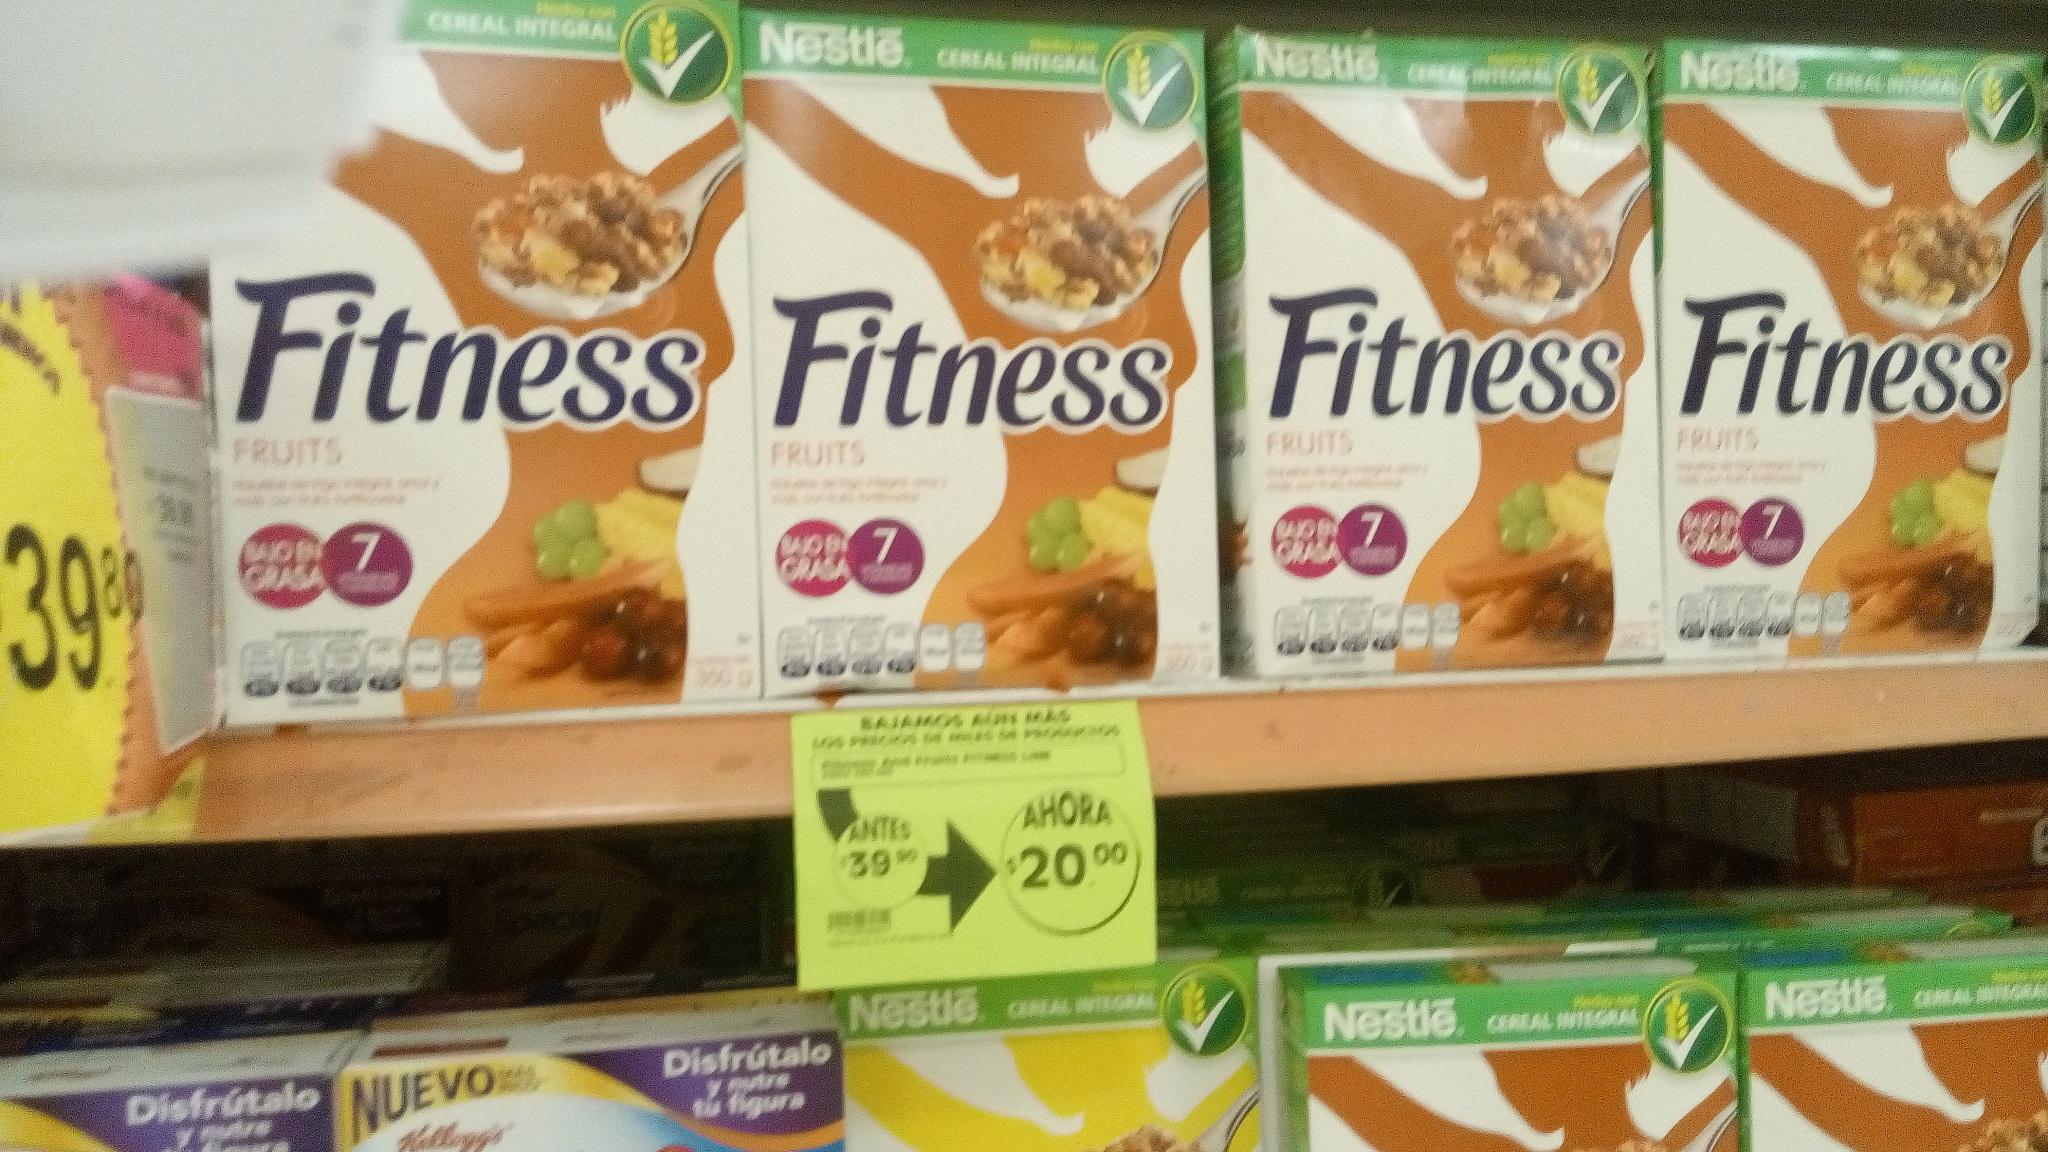 Comercial Mexicana: Cereal Fitness 350g de $39 a $20, Galletas Gamesa 2x1.5, descuento de $20 por cada $100 en T-Fal